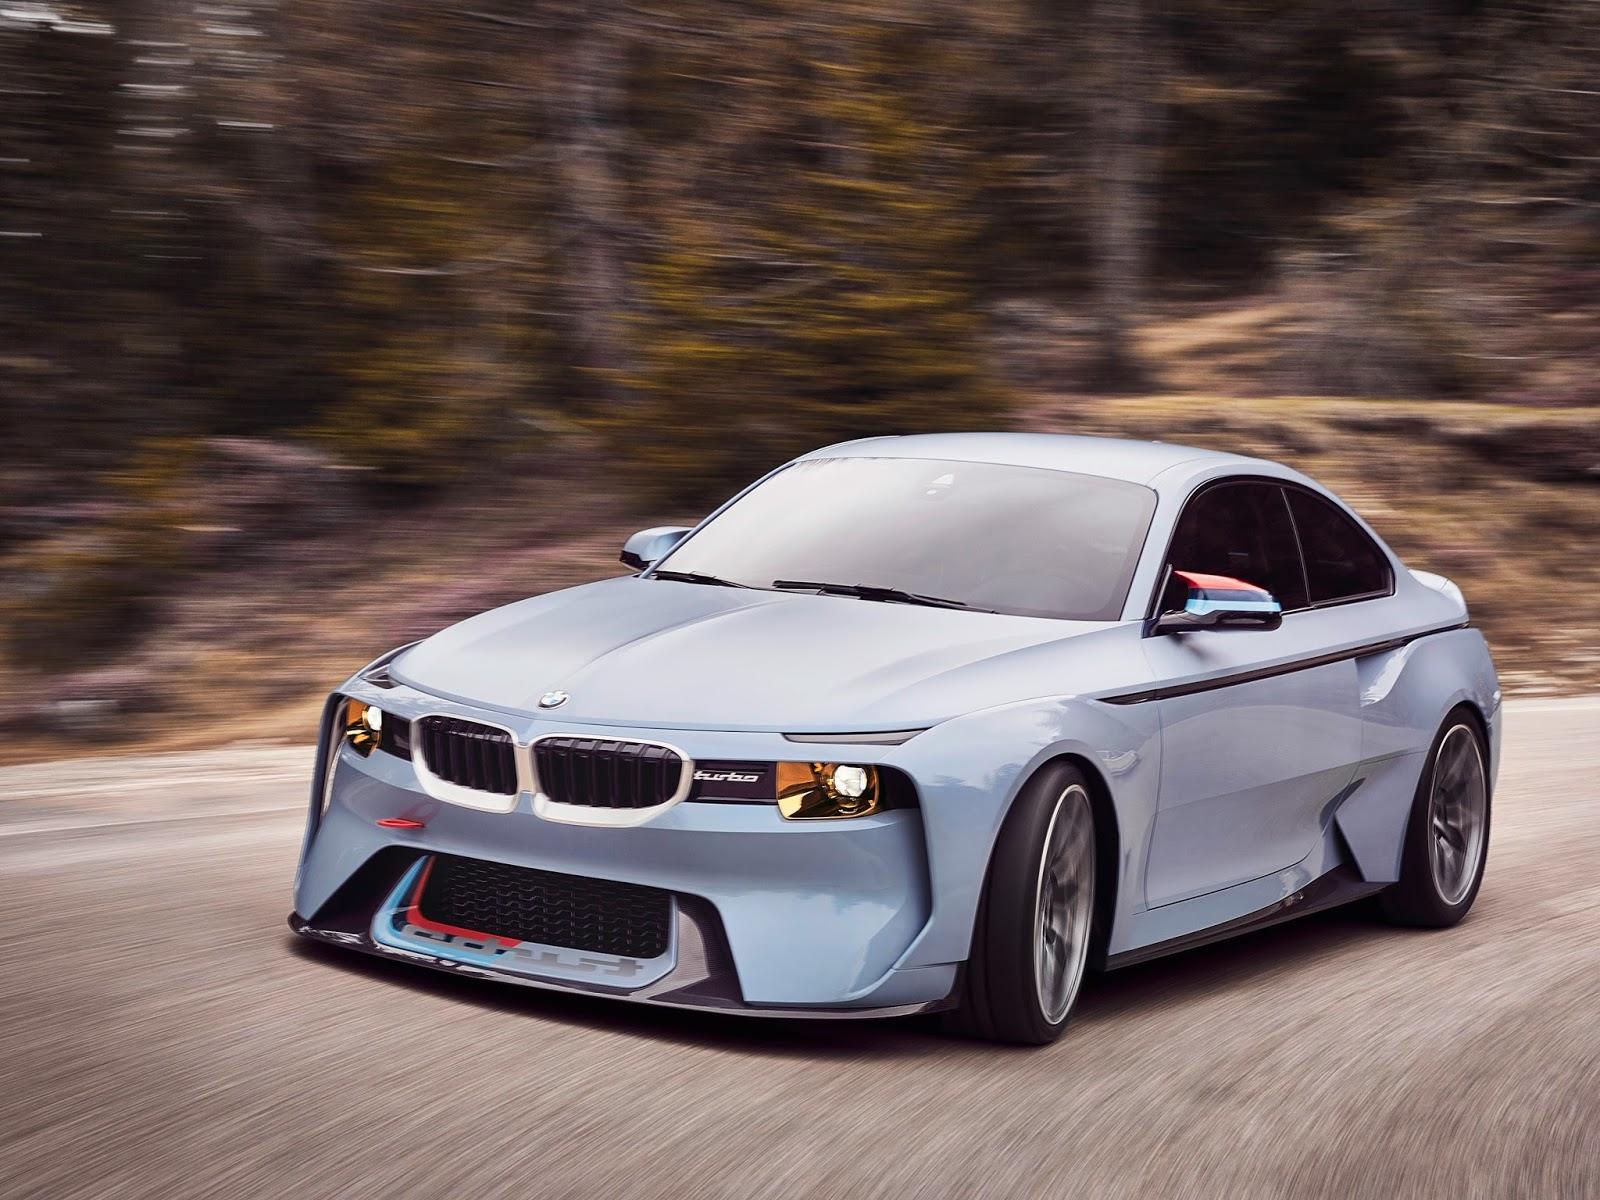 P90219730 highRes bmw 2002 hommage 05 1 1 H BMW γιορτάζει τα 50 χρόνια της θρυλικής 2002 turbo και παρουσιάζει την Bmw 2002 Hommage BMW, BMW 2002, BMW 2002 turbo, BMW Concept, BMW Hommage, supercars, videos